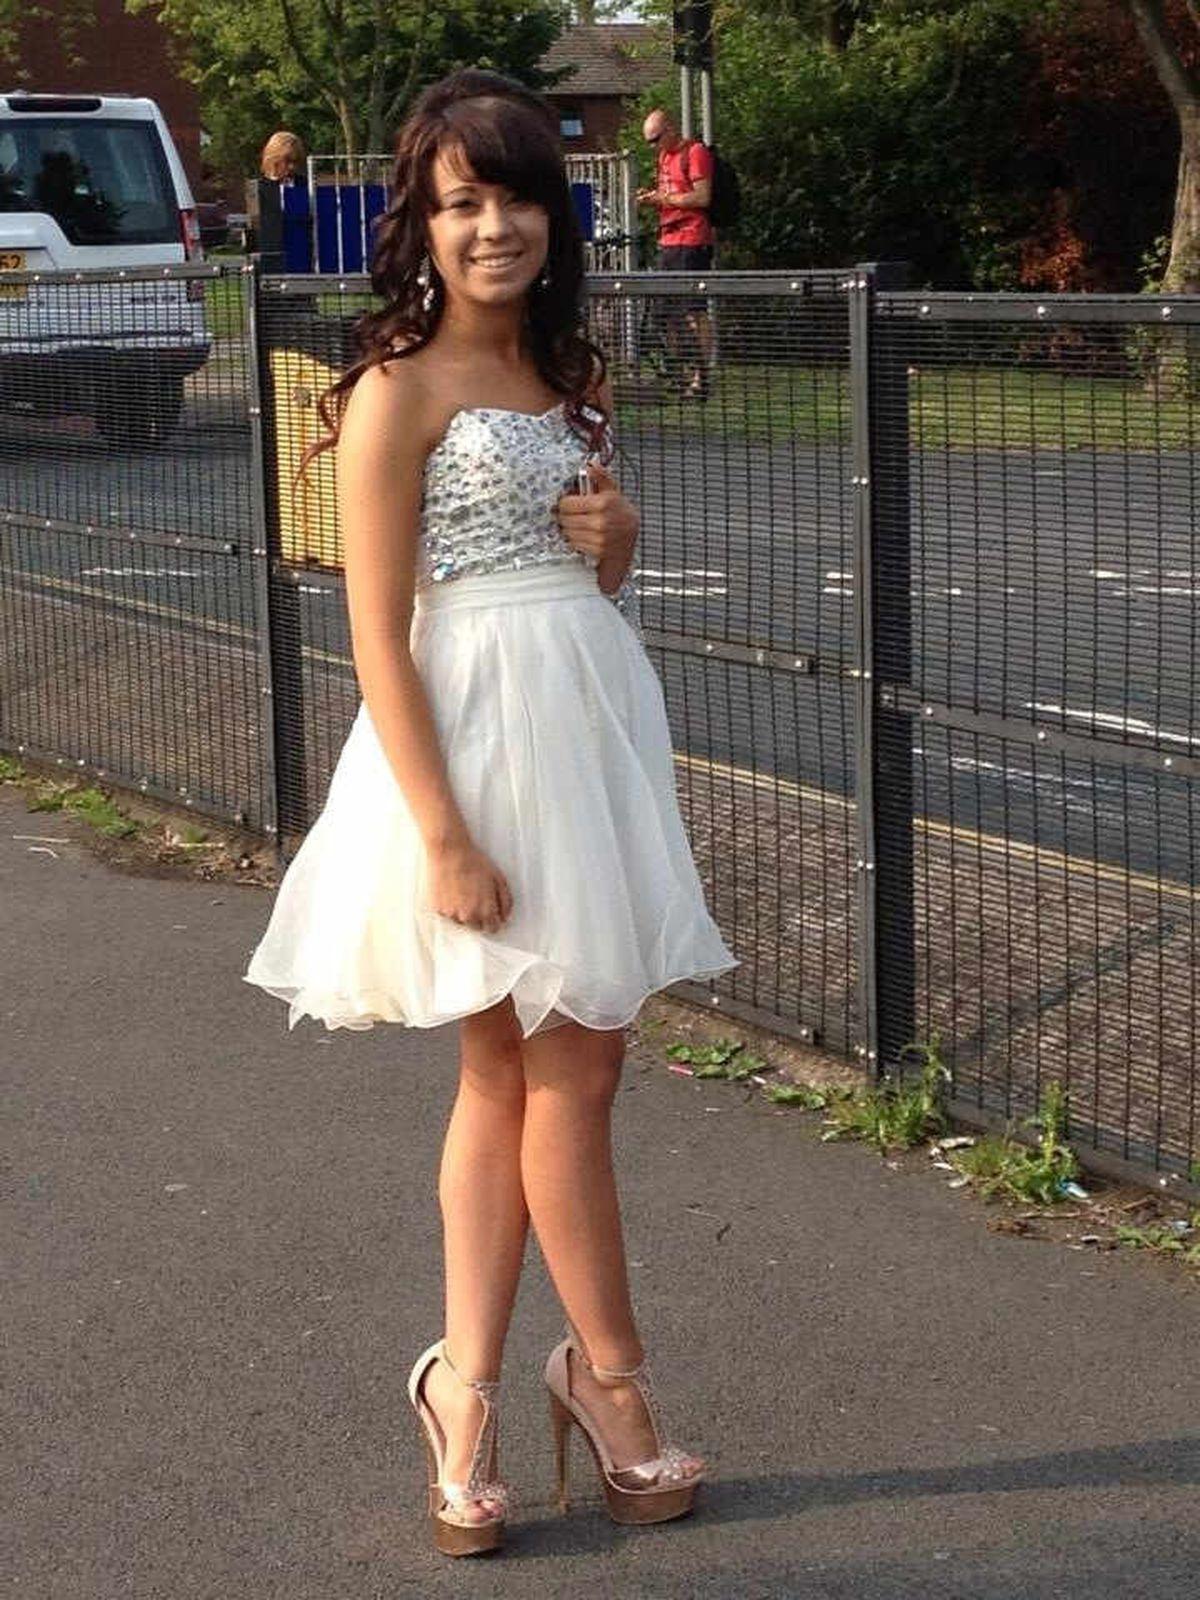 Emily Walker ready for Sundorne School prom, Shrewsbury